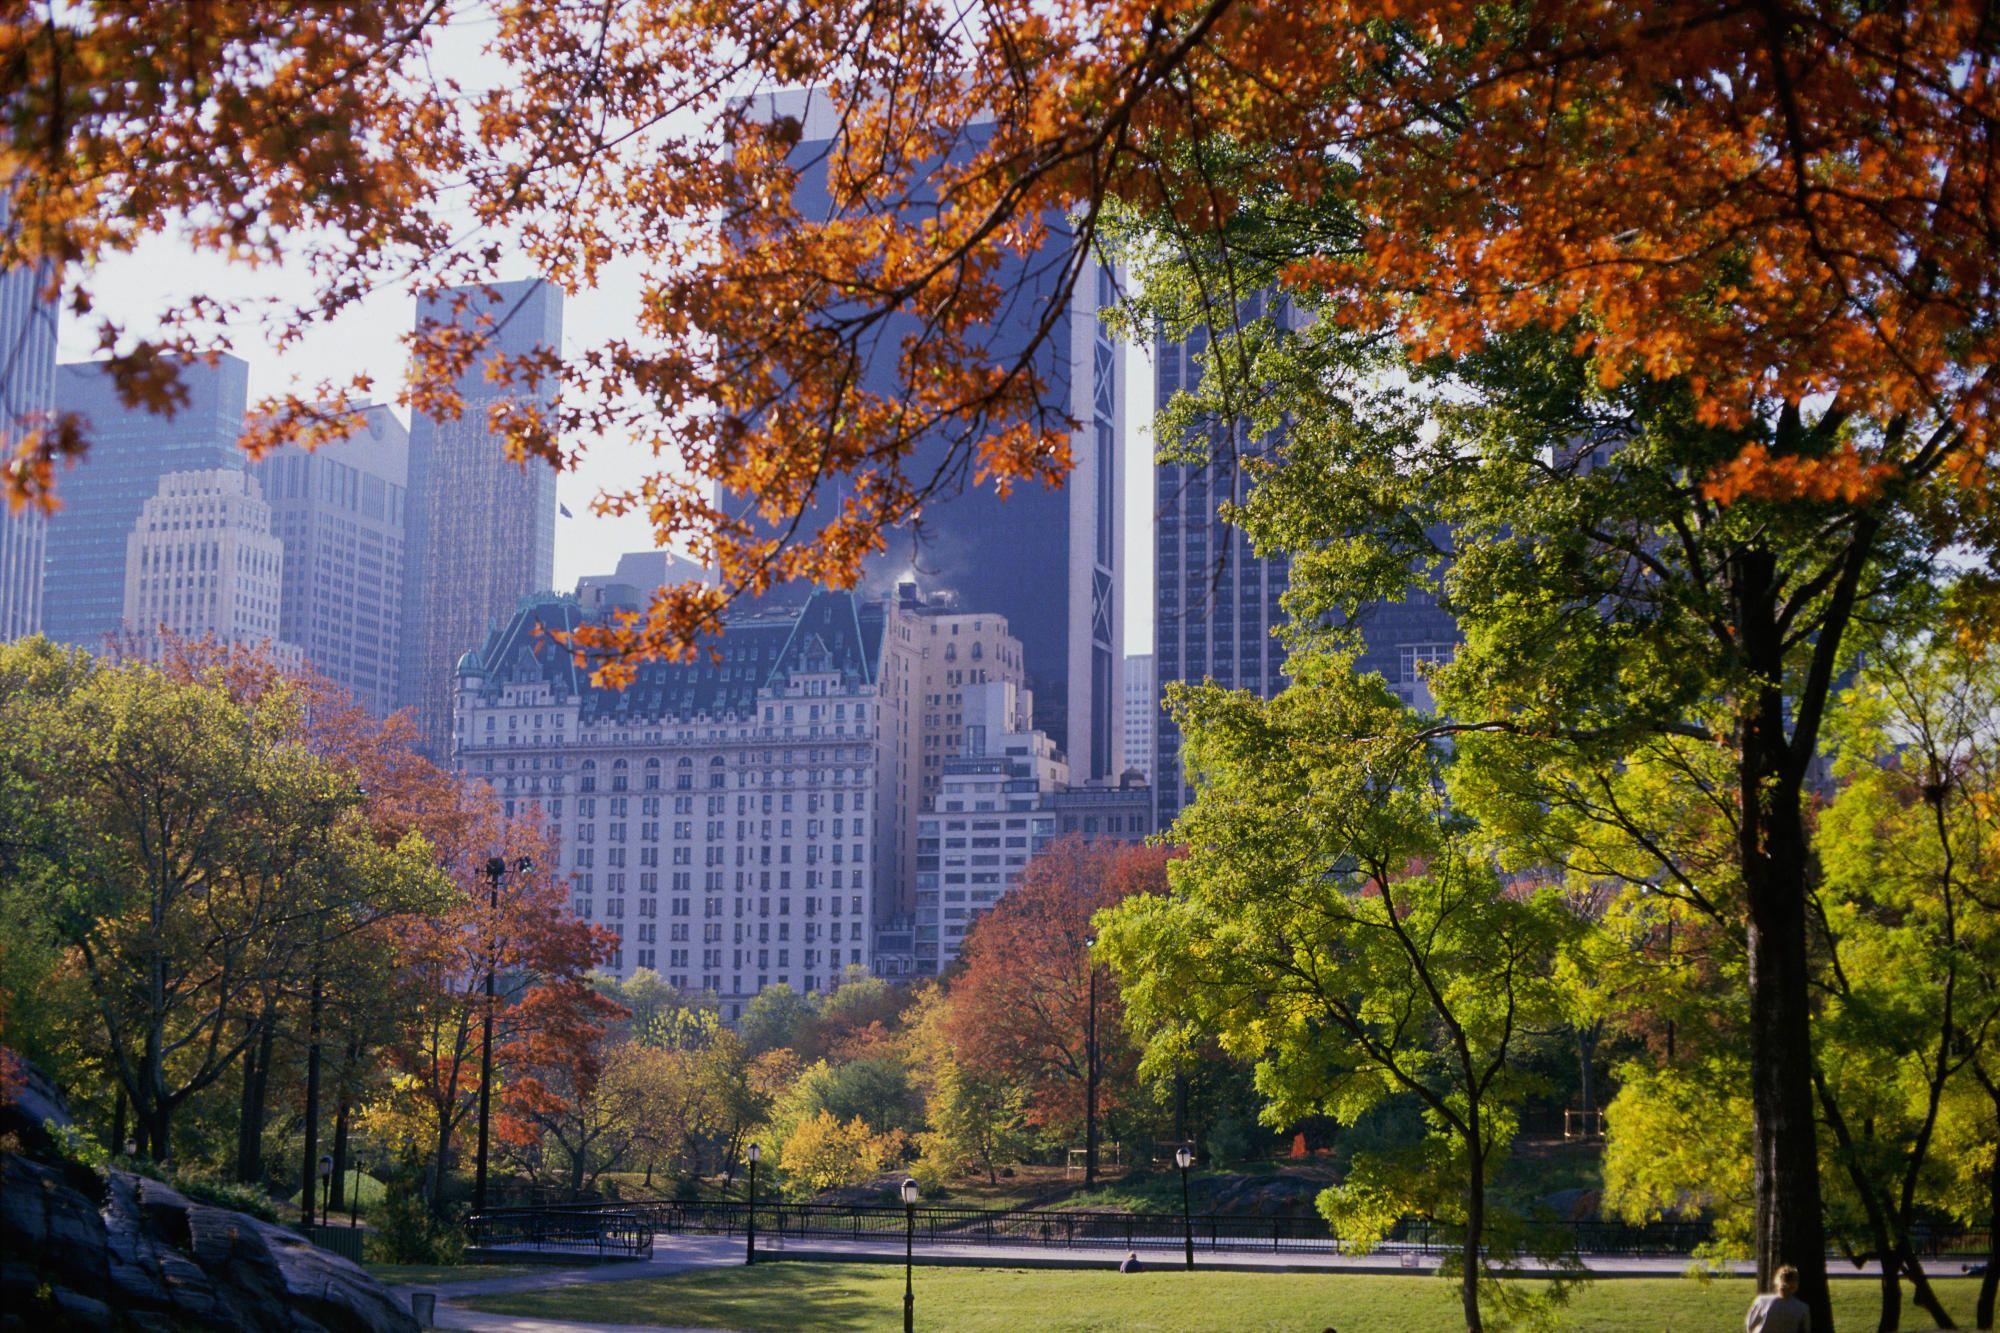 Cityscape Hd New York Wallpaper Autumn In New York New York Tourist Attractions